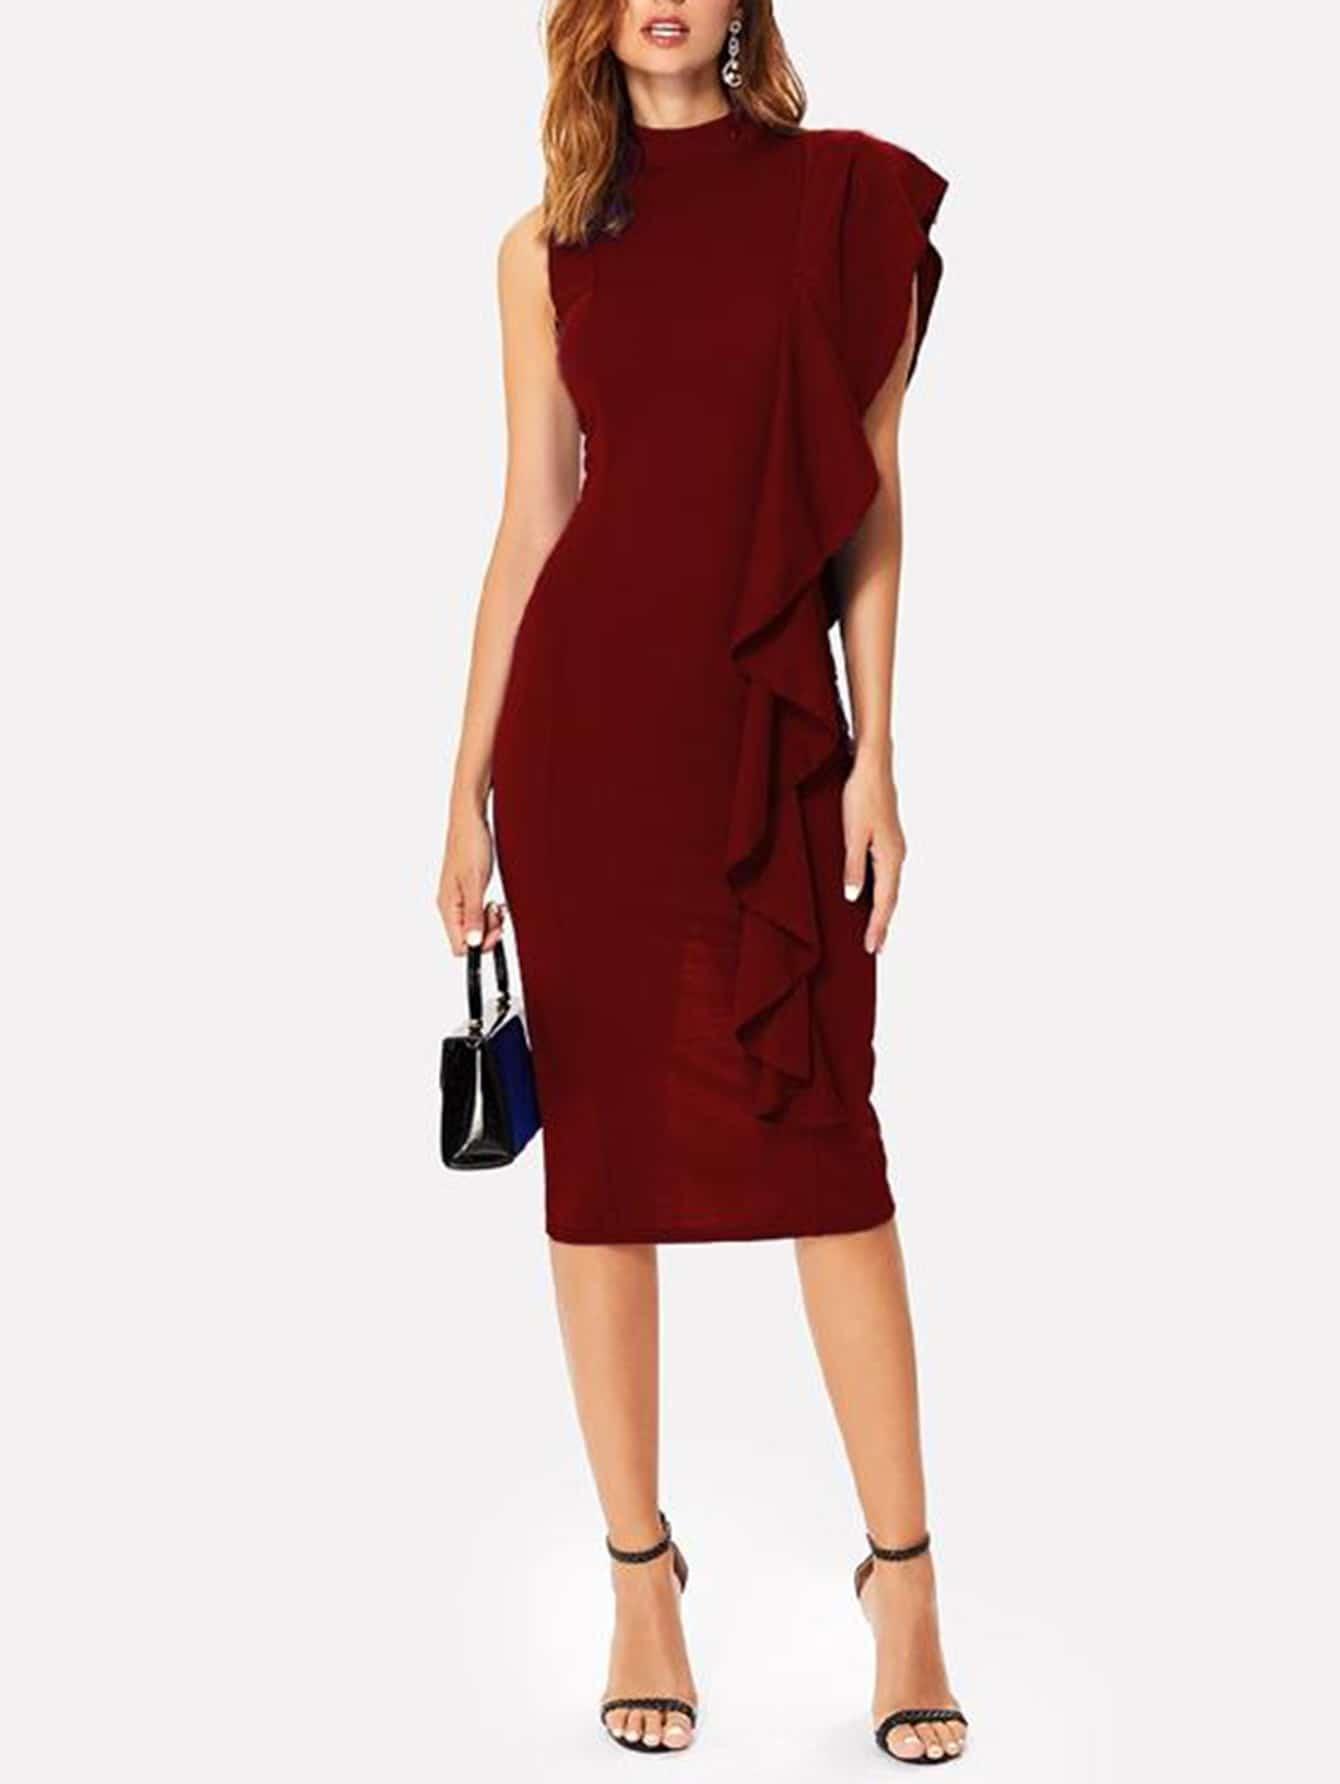 One Shoulder Ruffle Trim Mock Neck Midi Dress one shoulder ruffle embellished dress